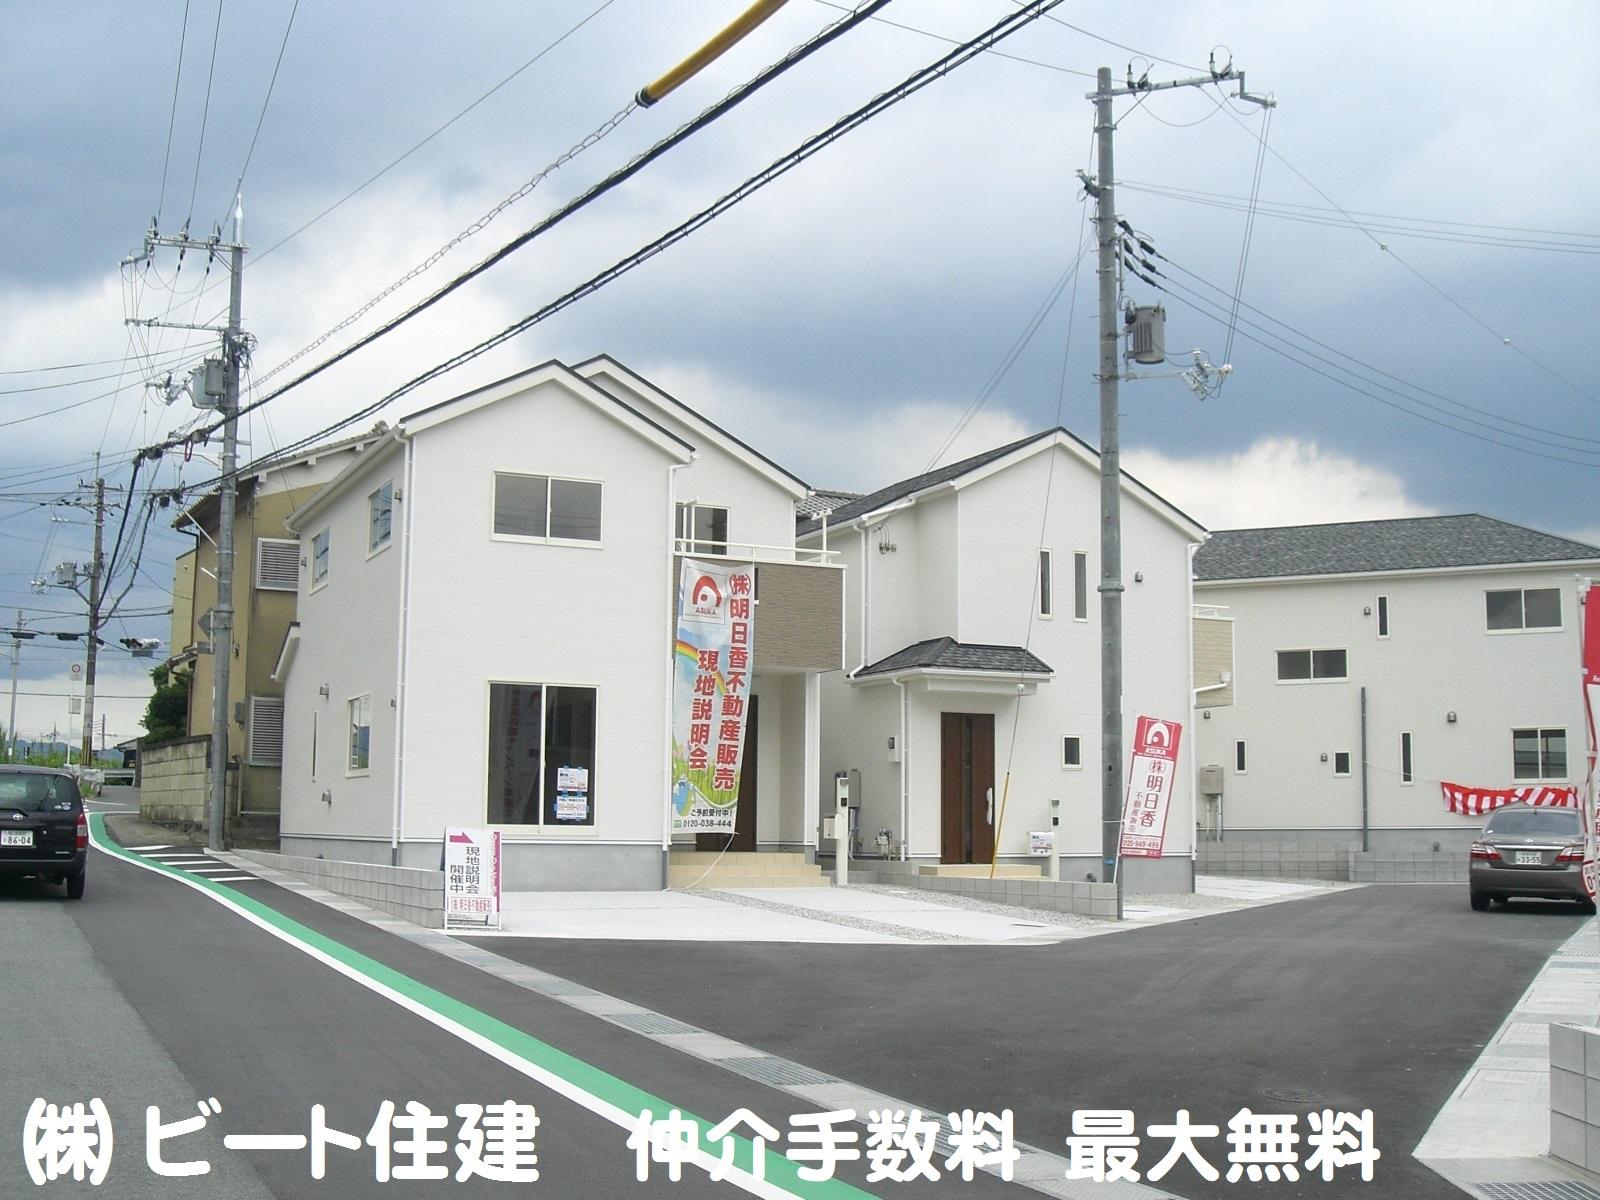 奈良県 新築 ビート住建 大和高田市 お買い得 仲介手数料 最大無料